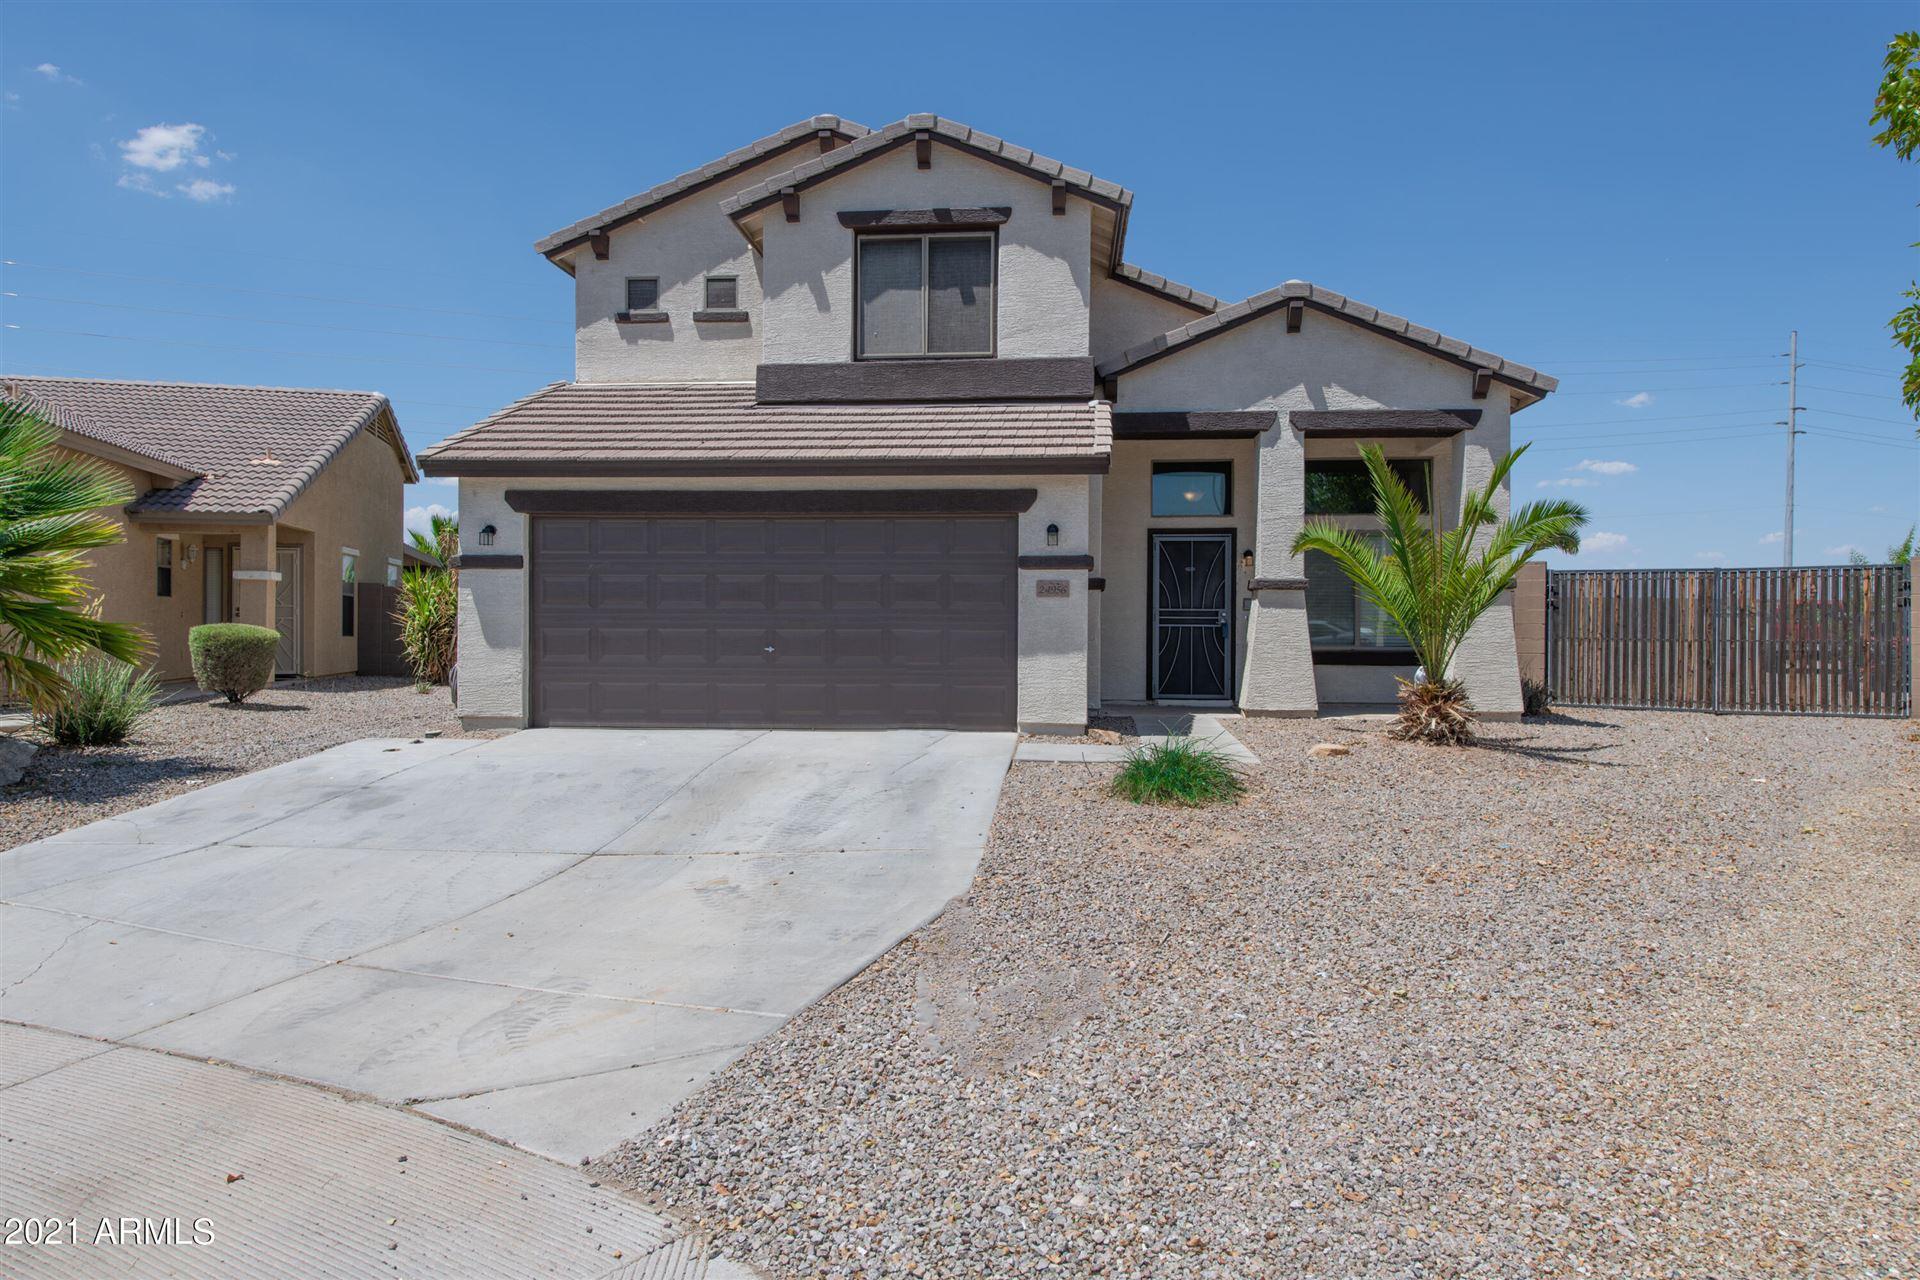 24956 W ILLINI Street, Buckeye, AZ 85326 - MLS#: 6255943